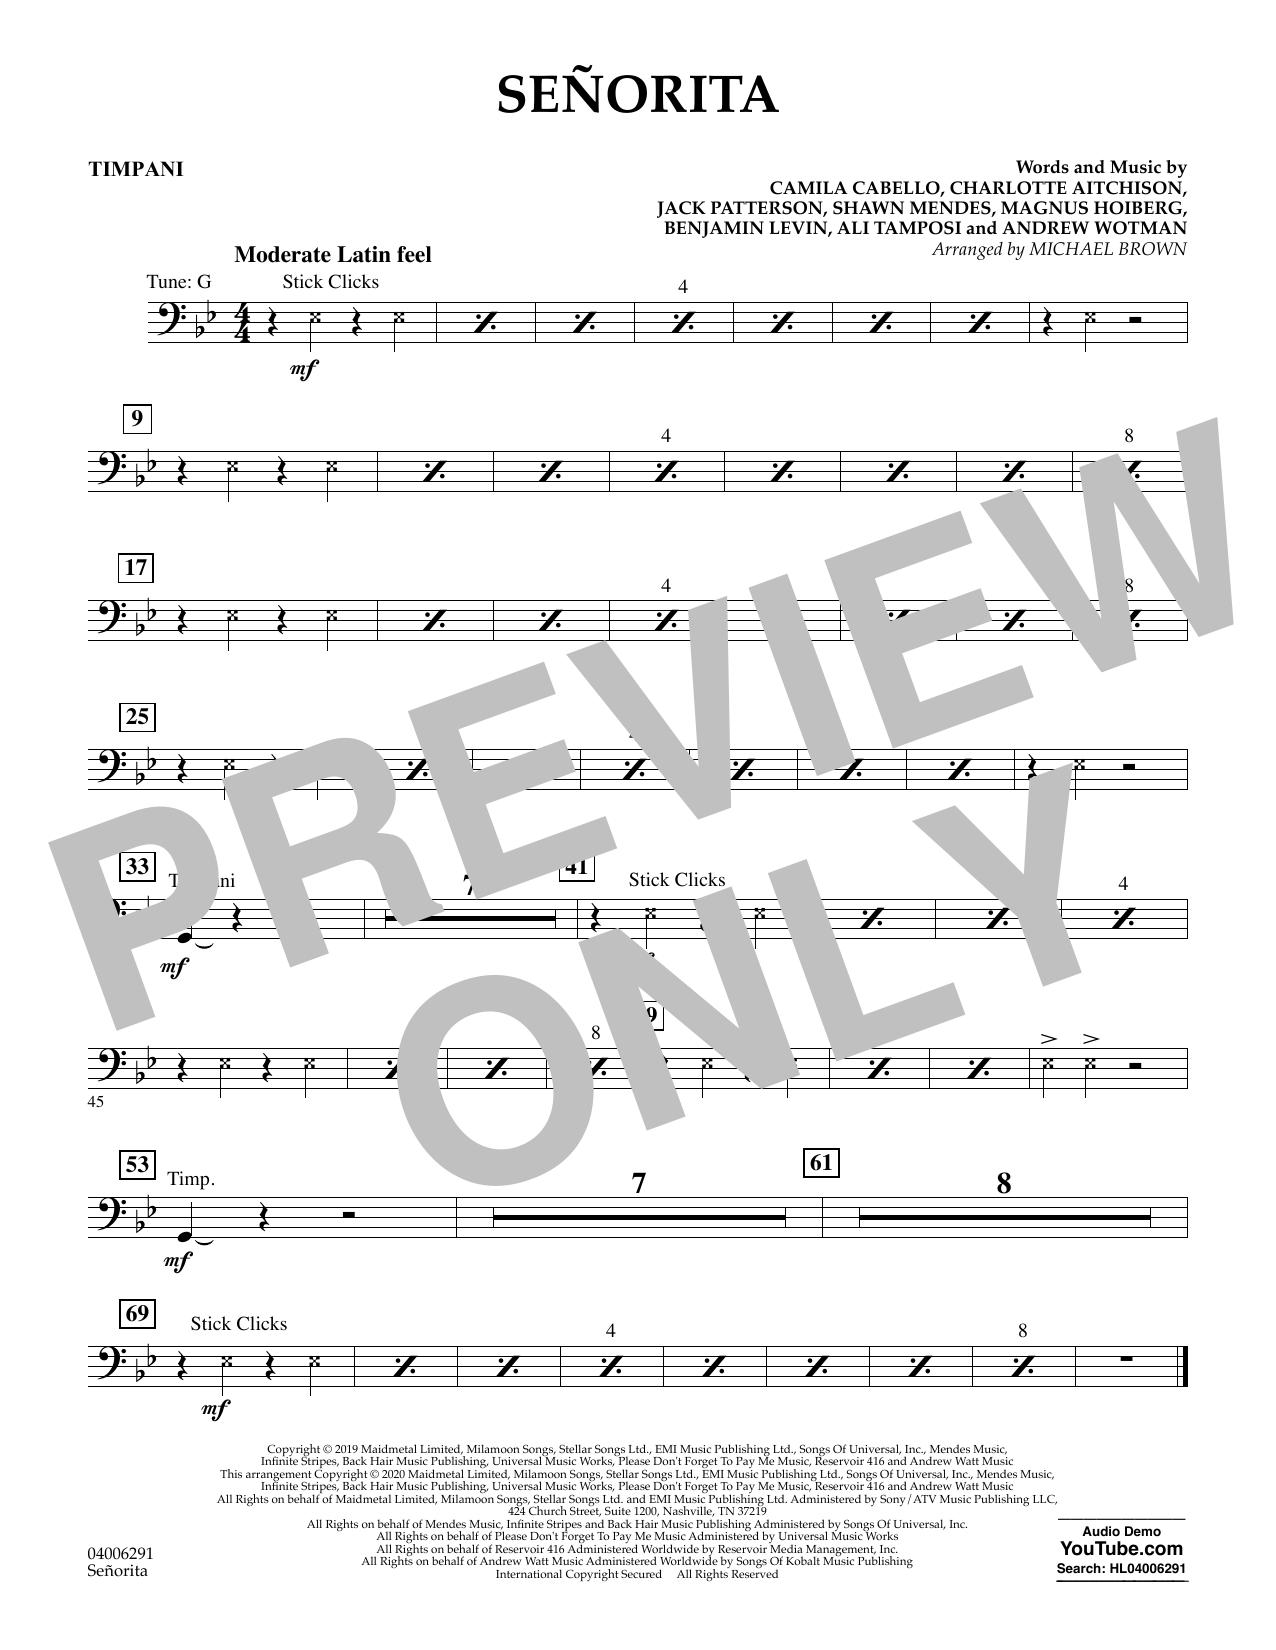 Señorita (arr. Michael Brown) - Timpani (Concert Band)